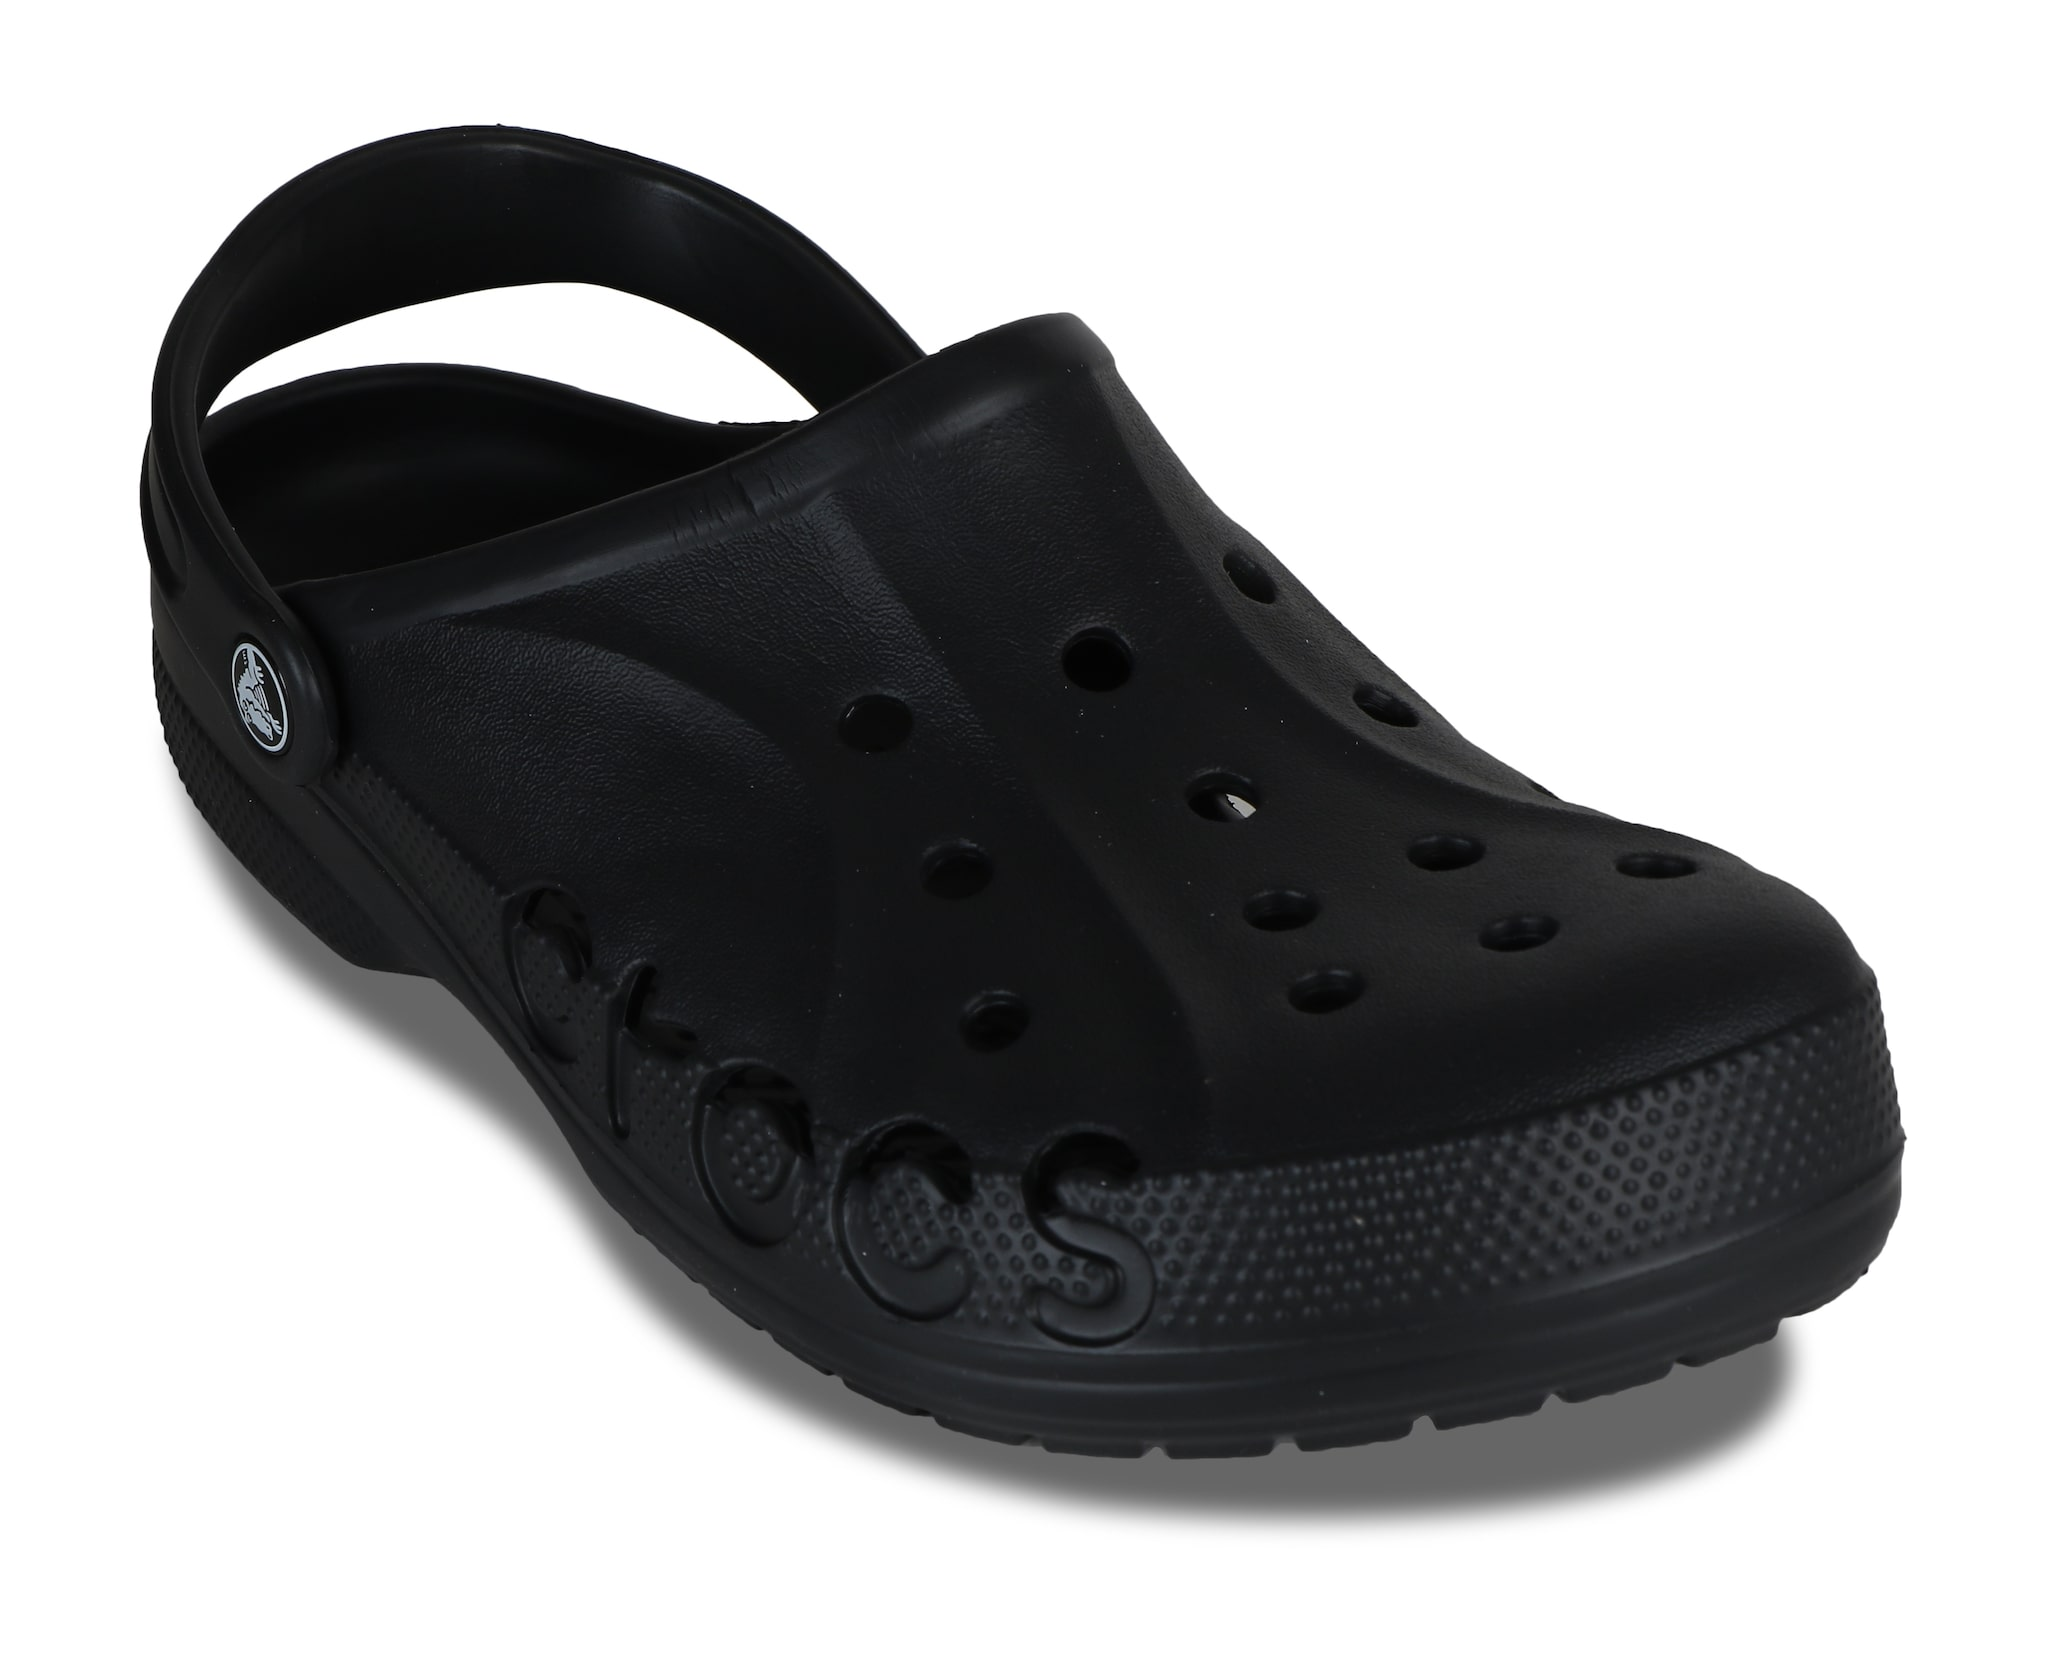 Clogs Work Clogs For Men Sandals and Floater Rubber Crock Anti slip Red//Black